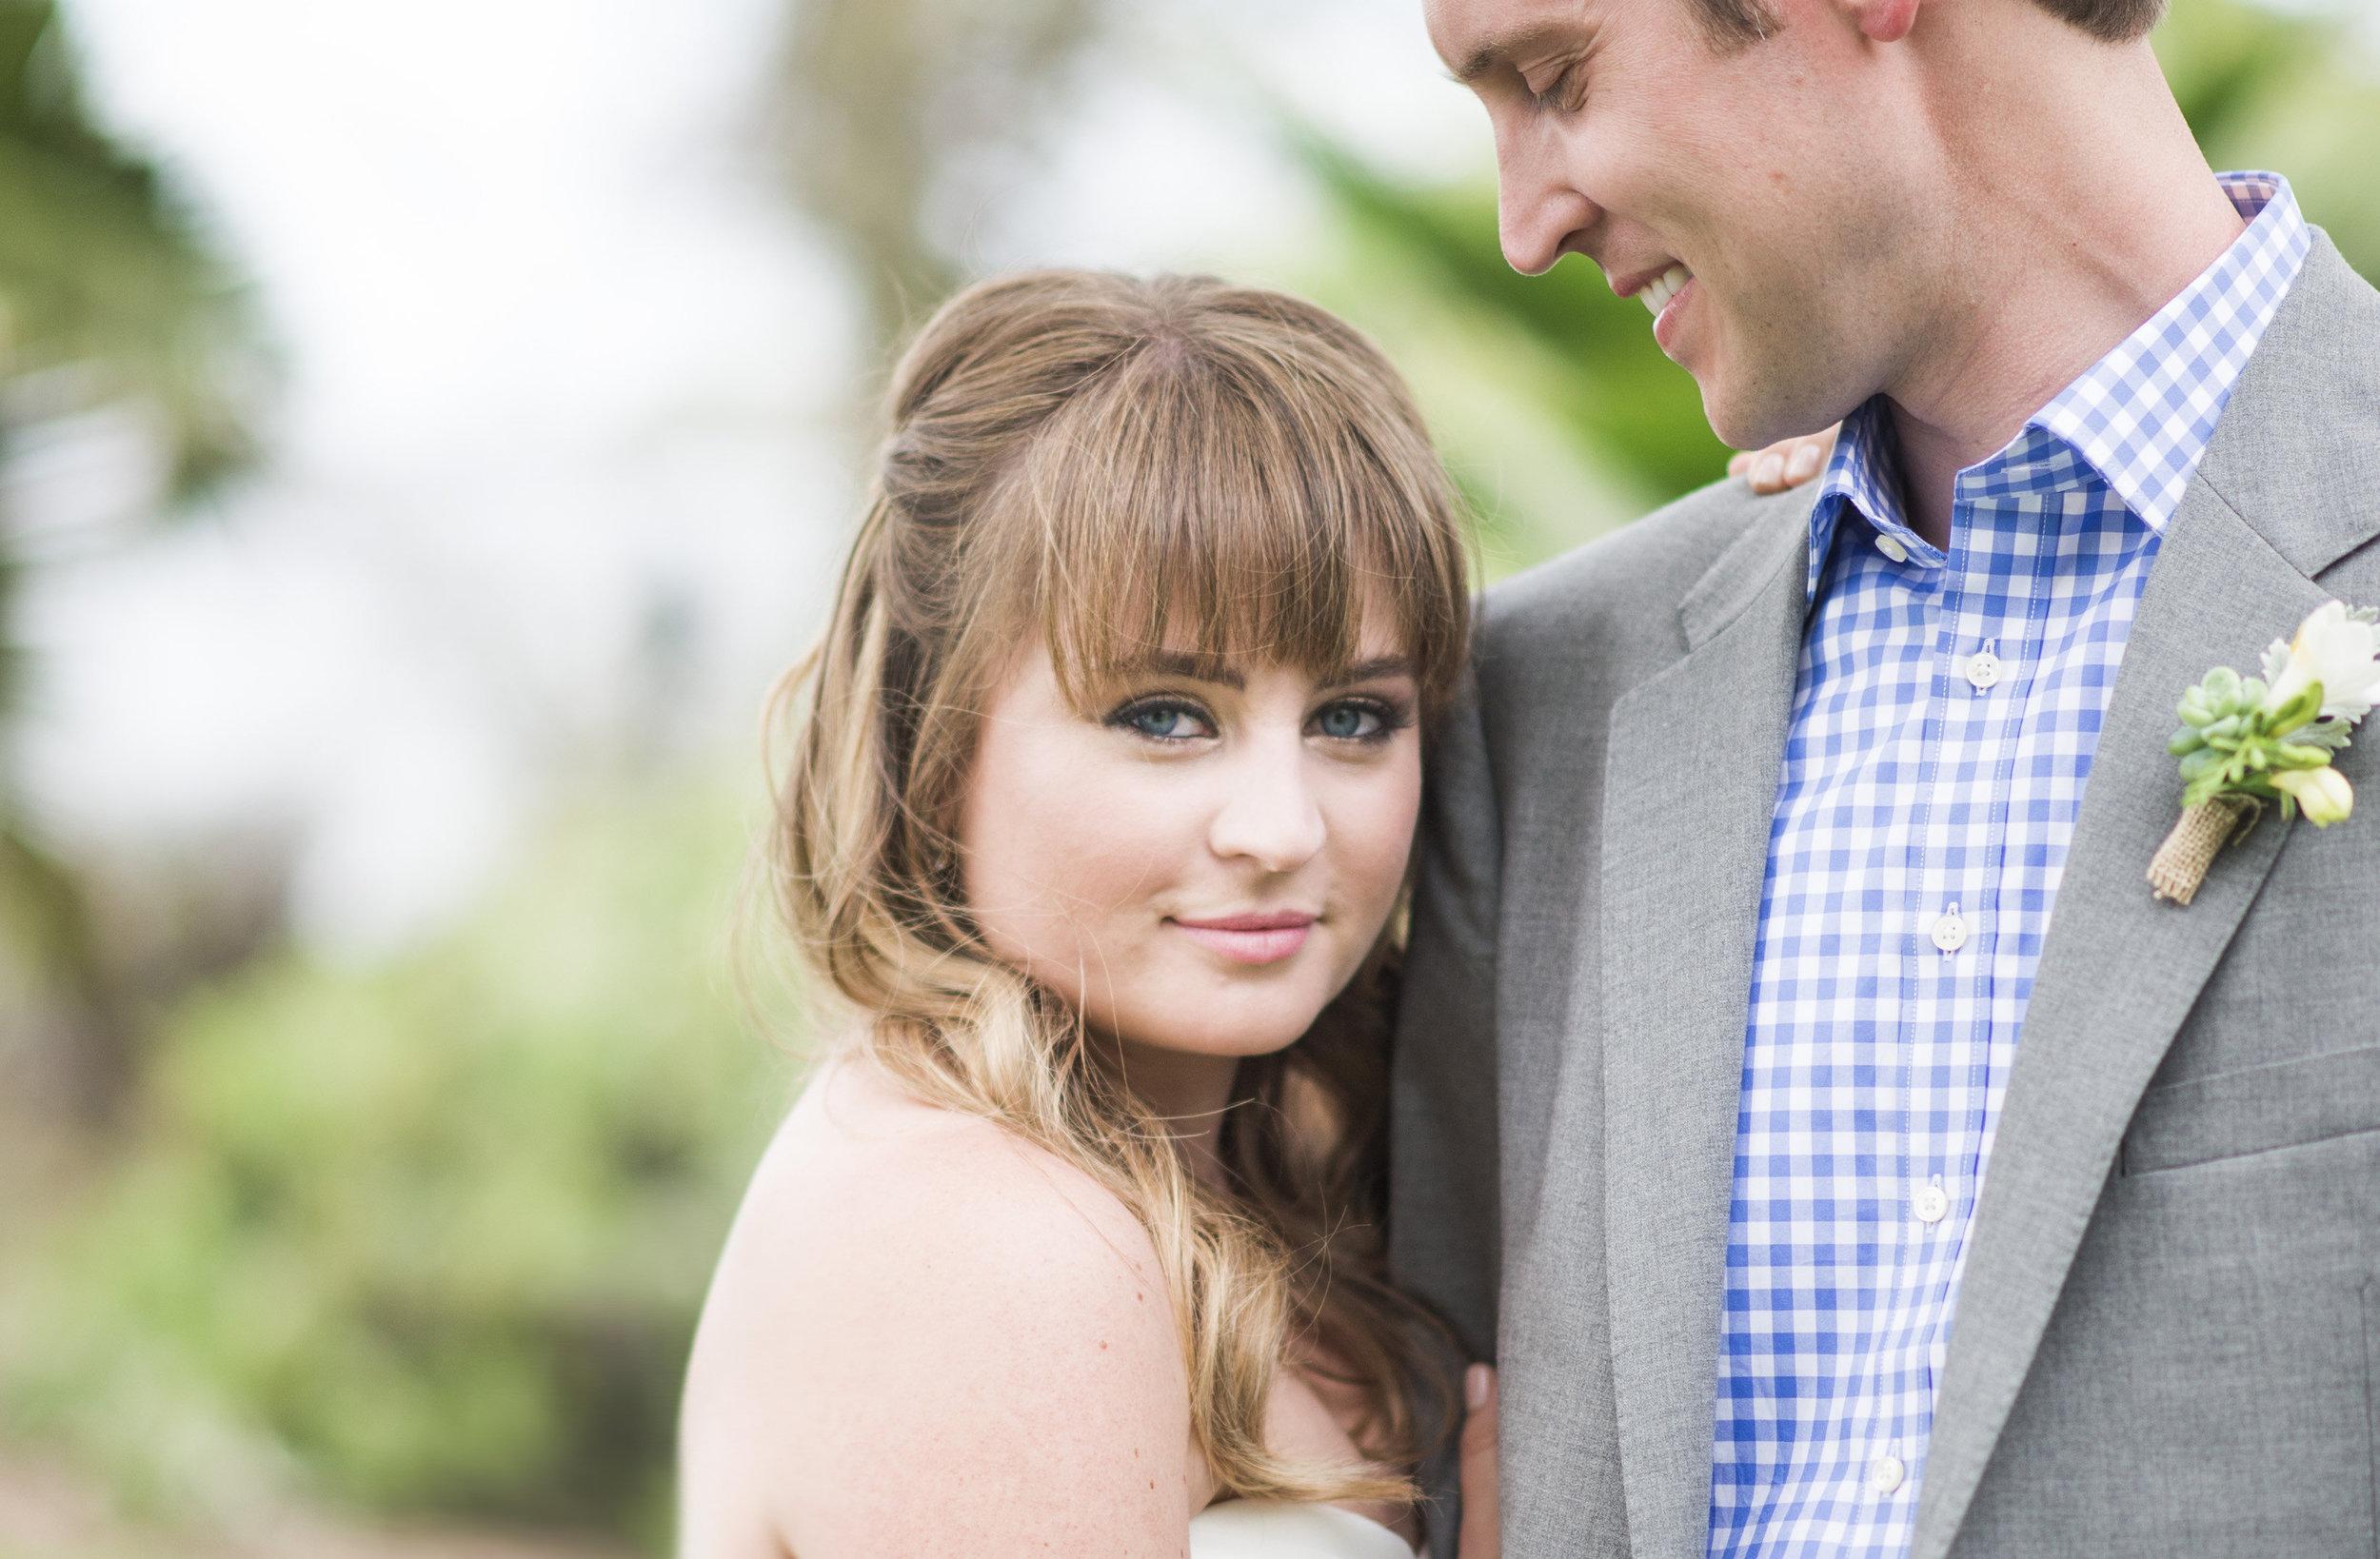 Destination Wedding by Bliss - Maui, Hawaii